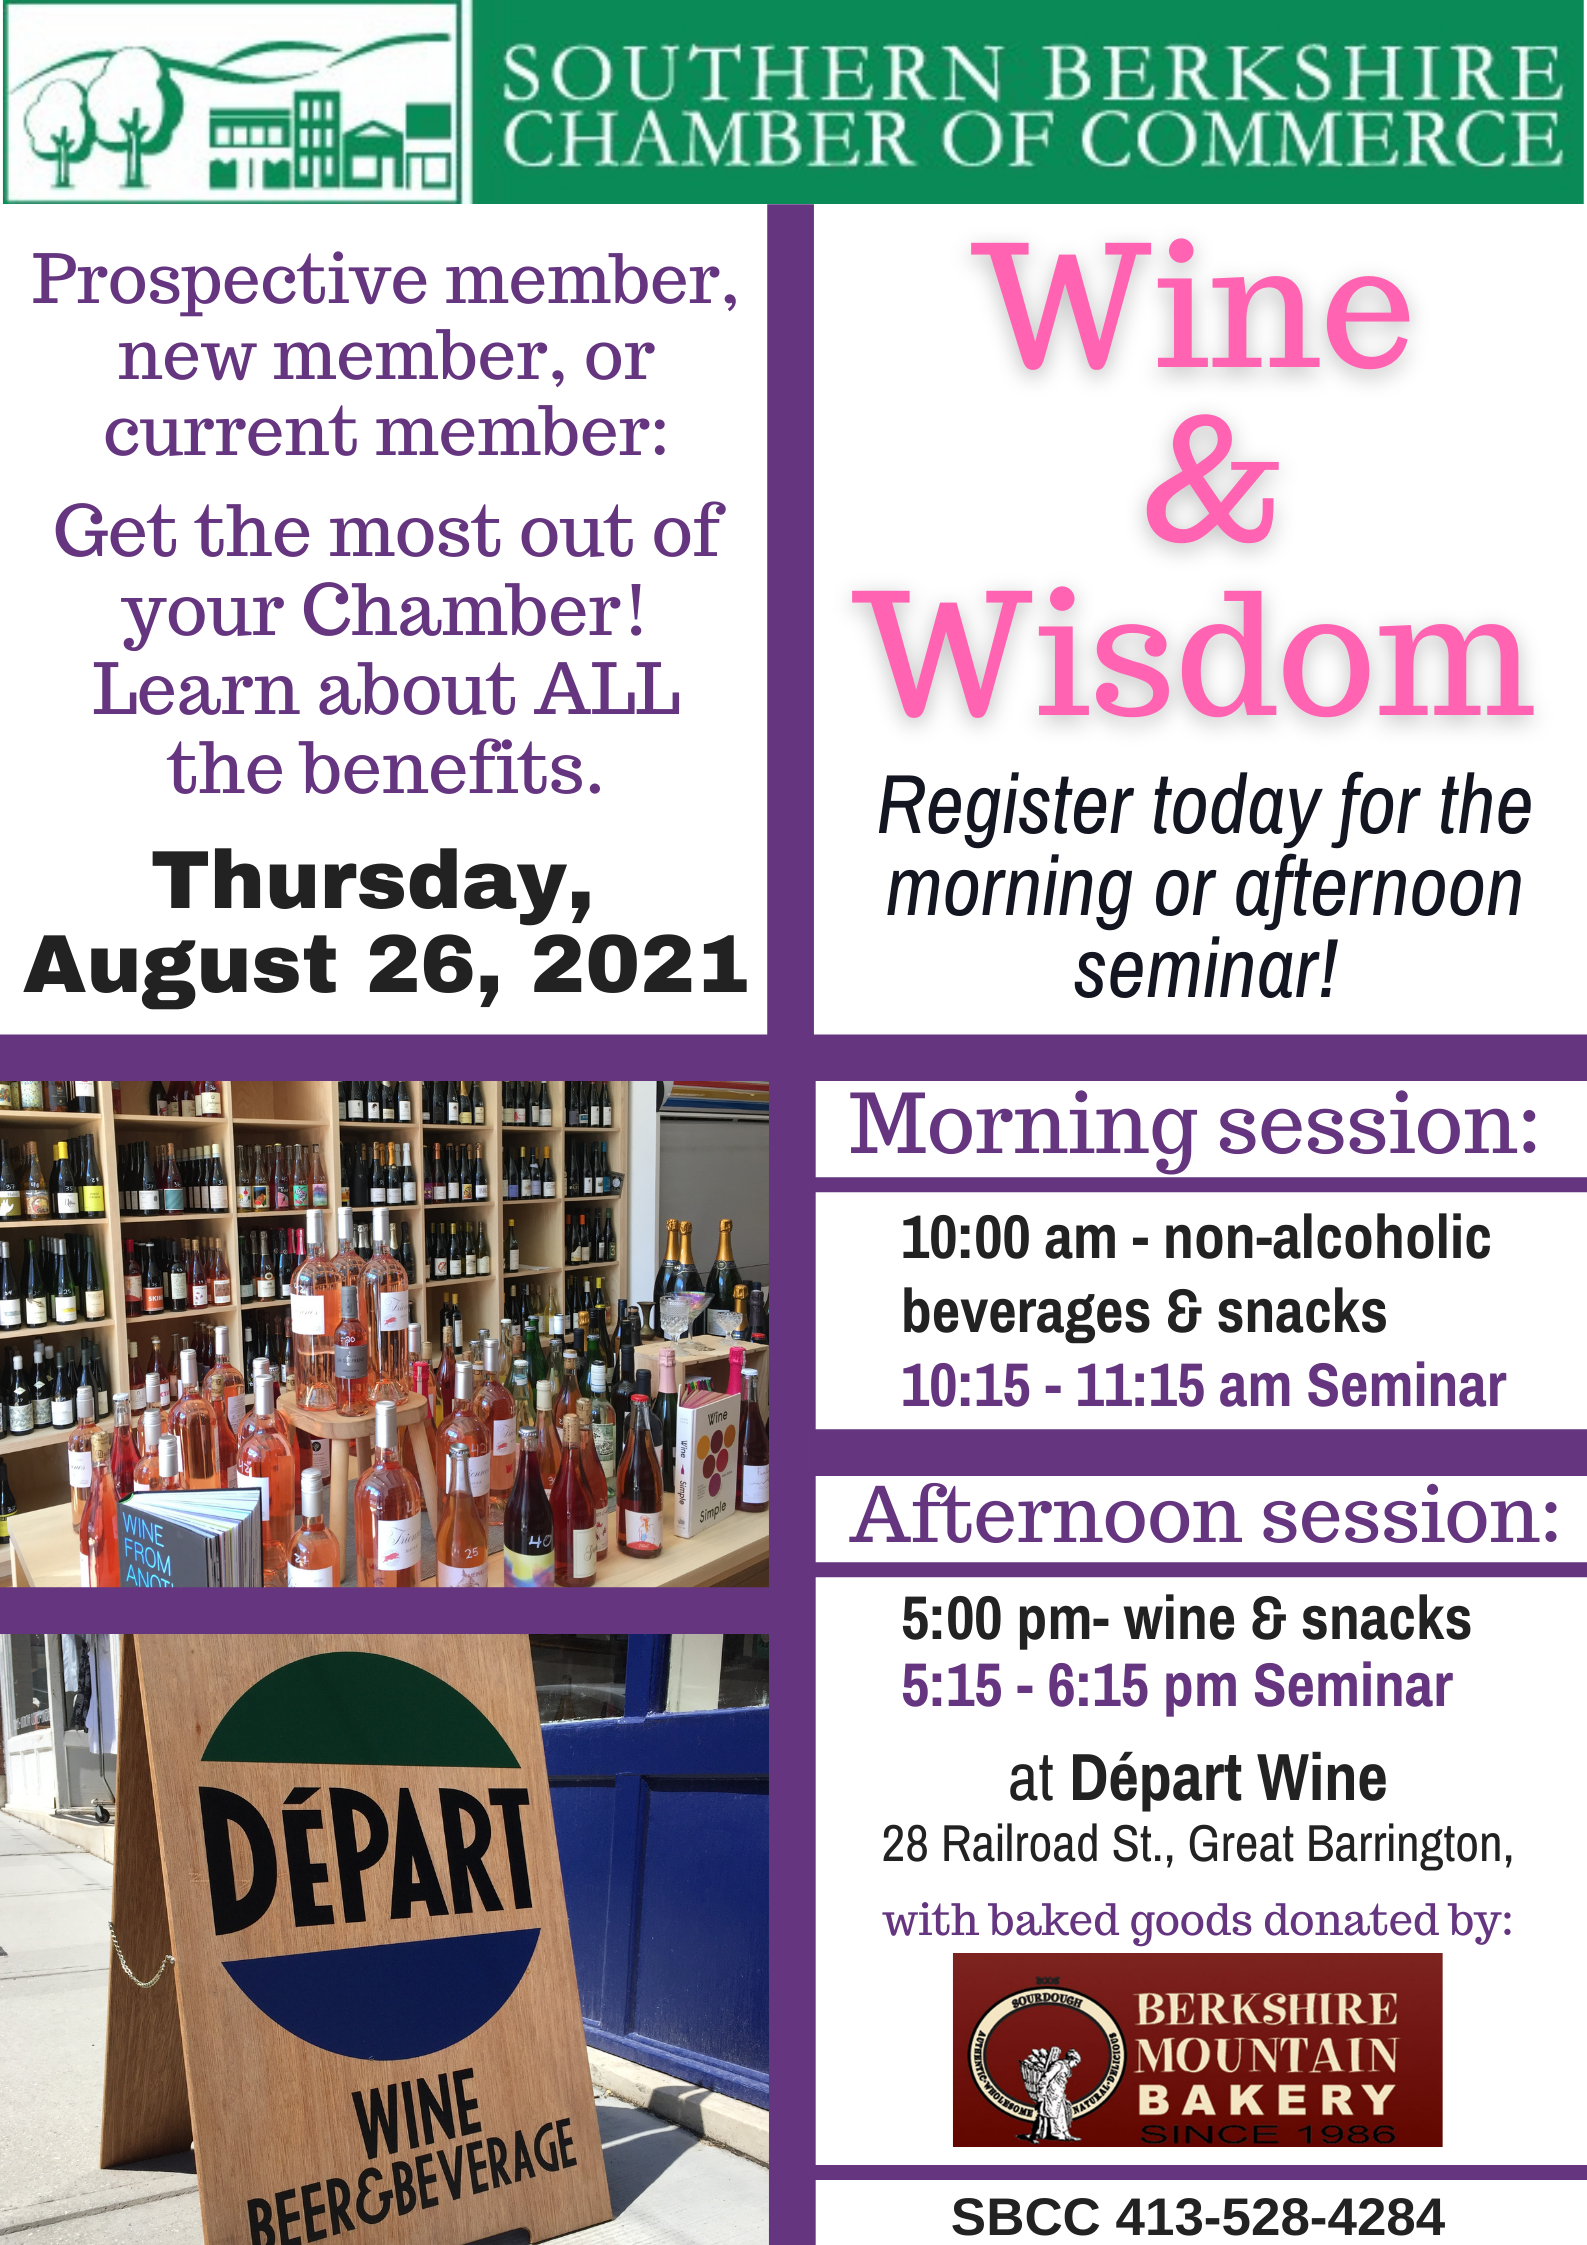 Wine & Wisdom - Morning Seminar